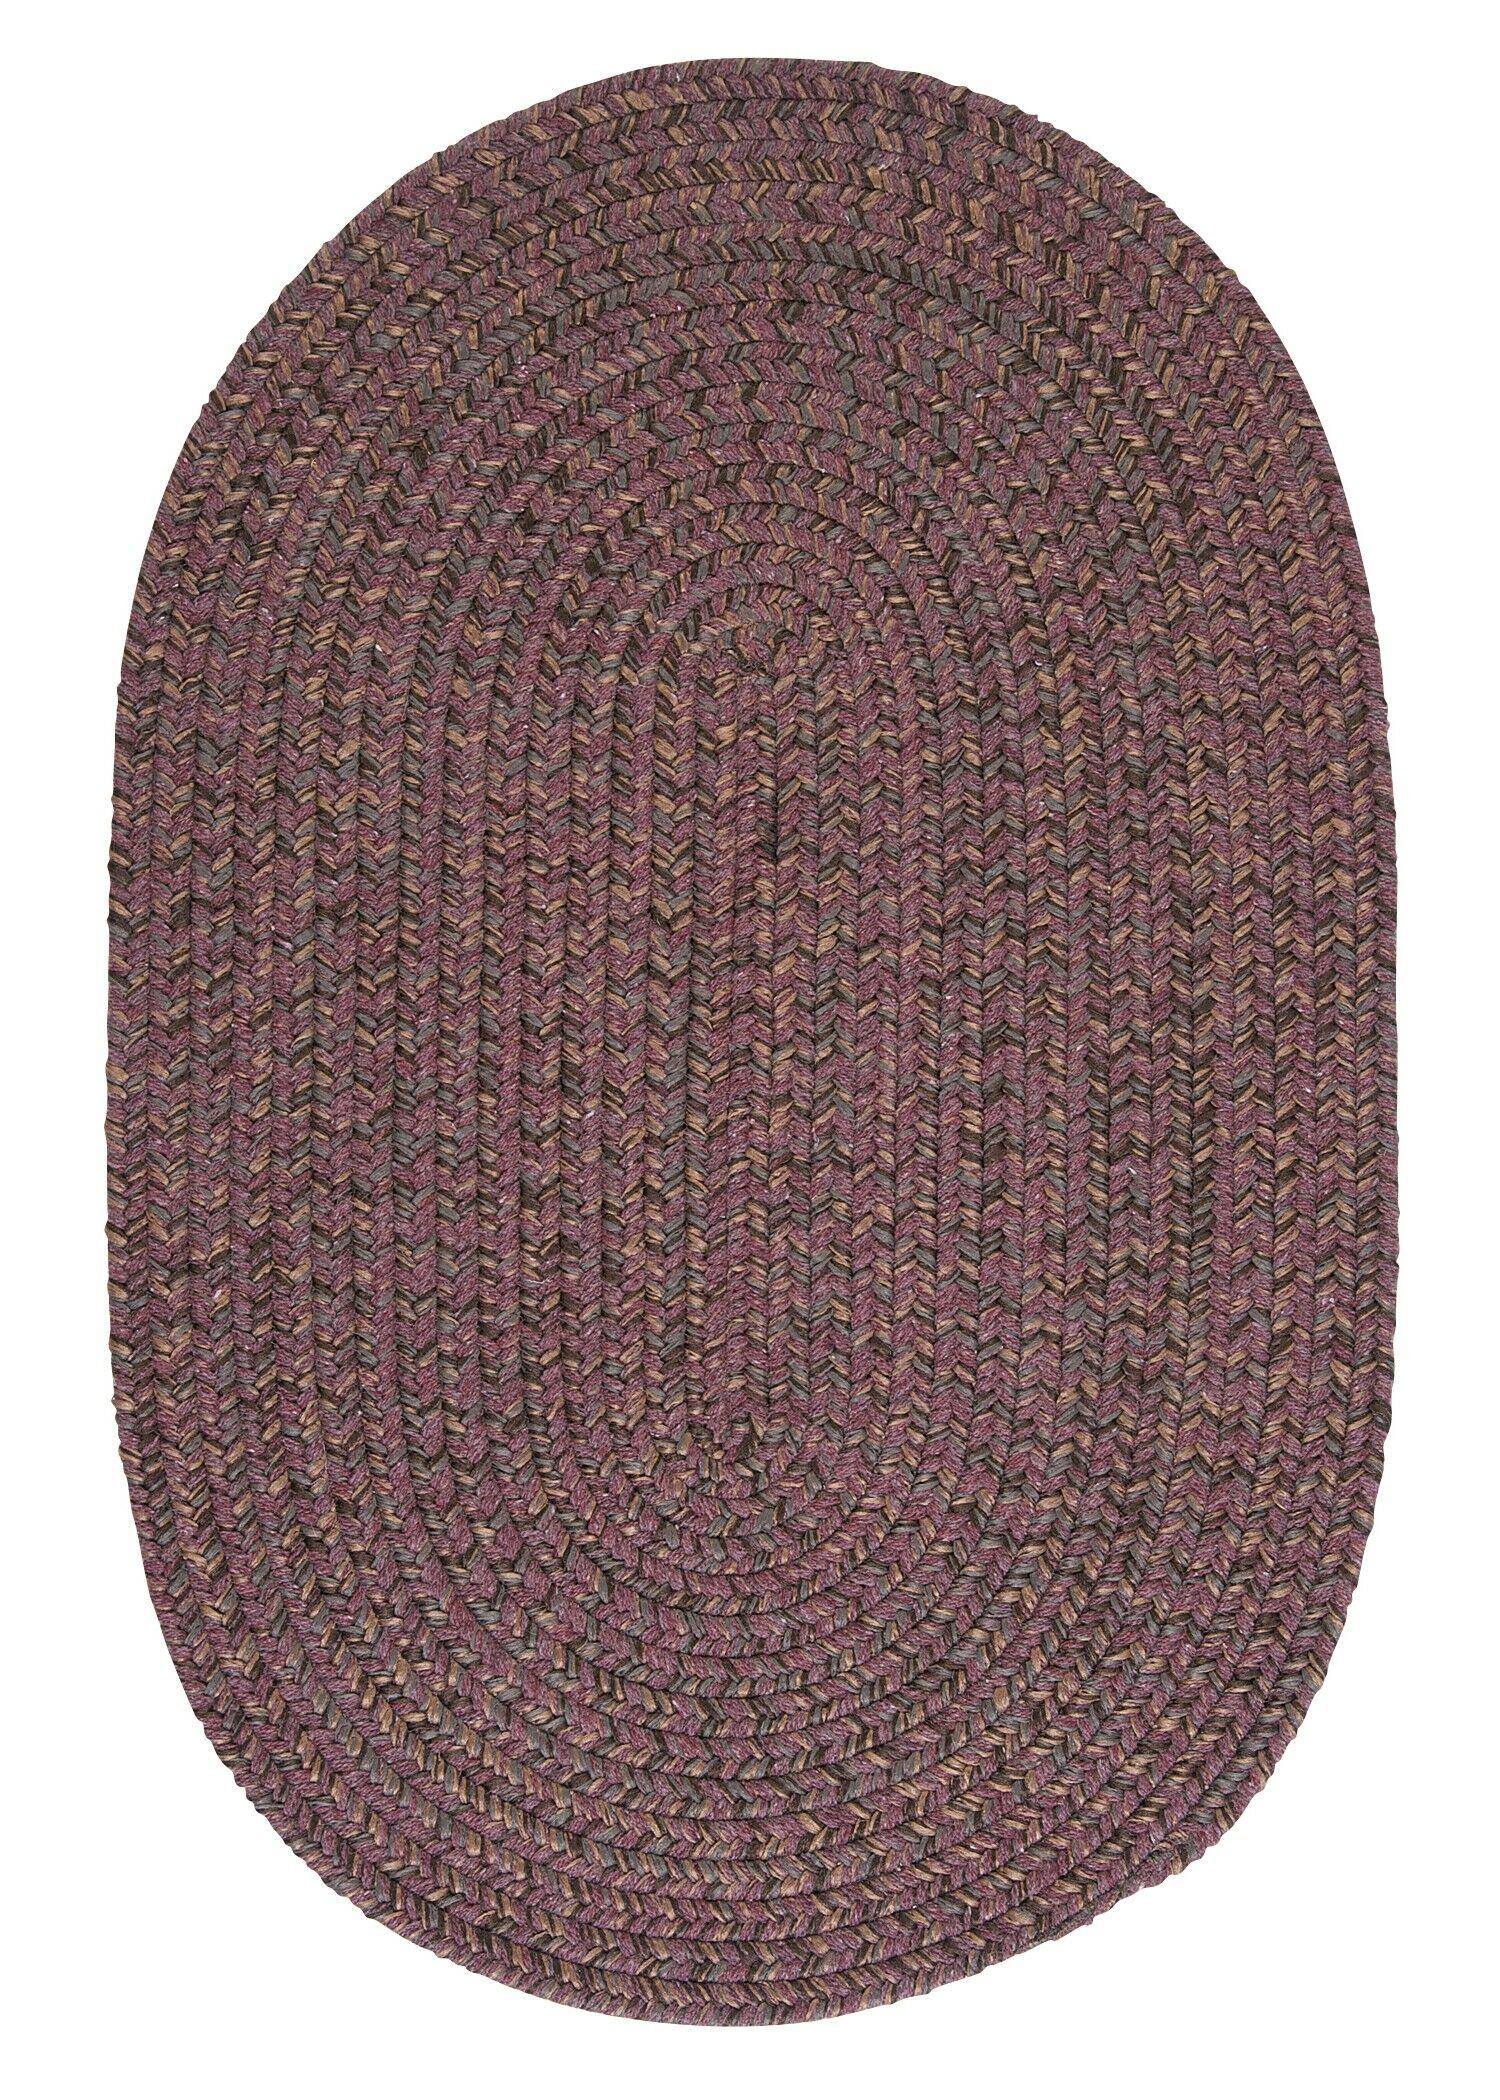 Abey Plum Purple Area Rug Rug Size: Round 6'